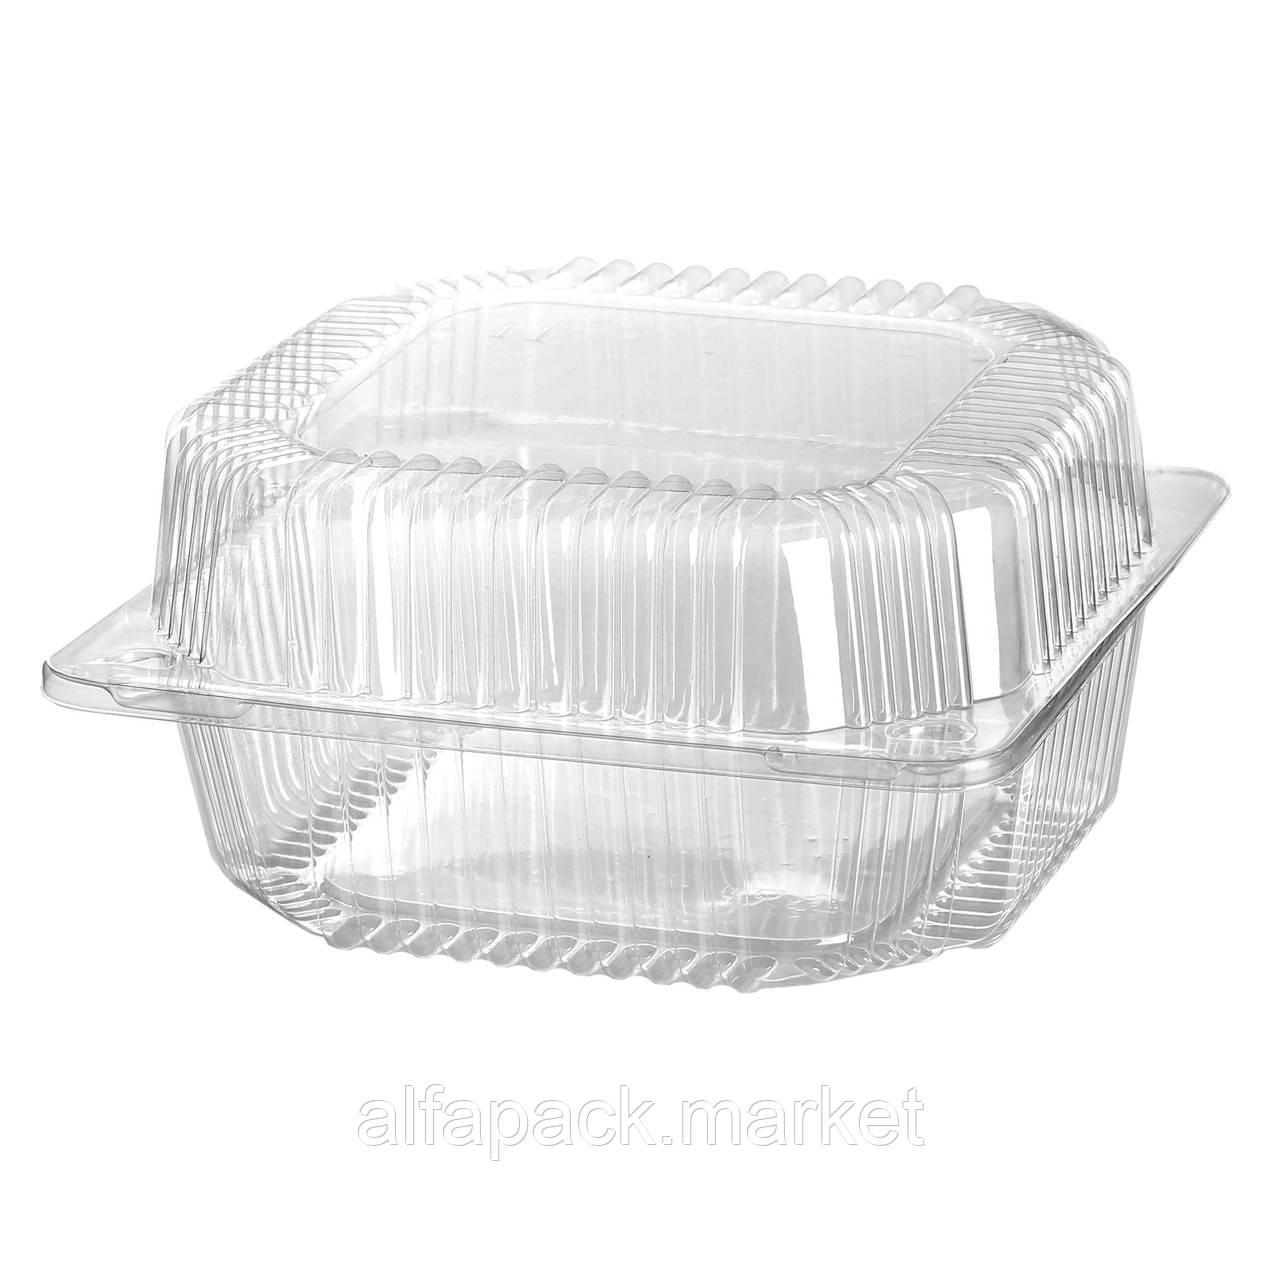 ПС-100 Пластиковий контейнер 135*130*77 (500 шт в ящику) 010100019